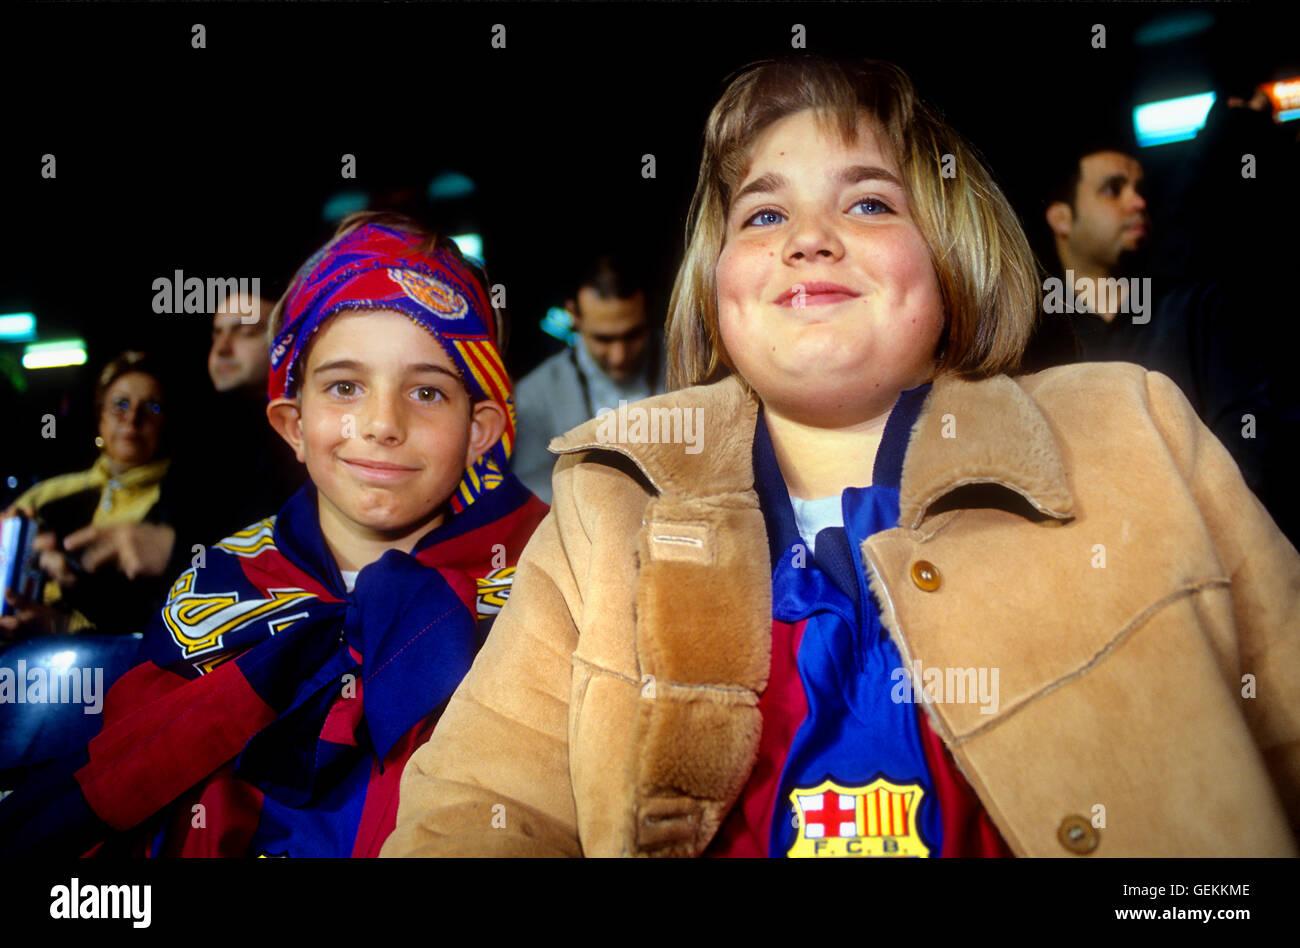 Fans of FC Barcelona. In Camp Nou stadium. Barcelona,spain - Stock Image